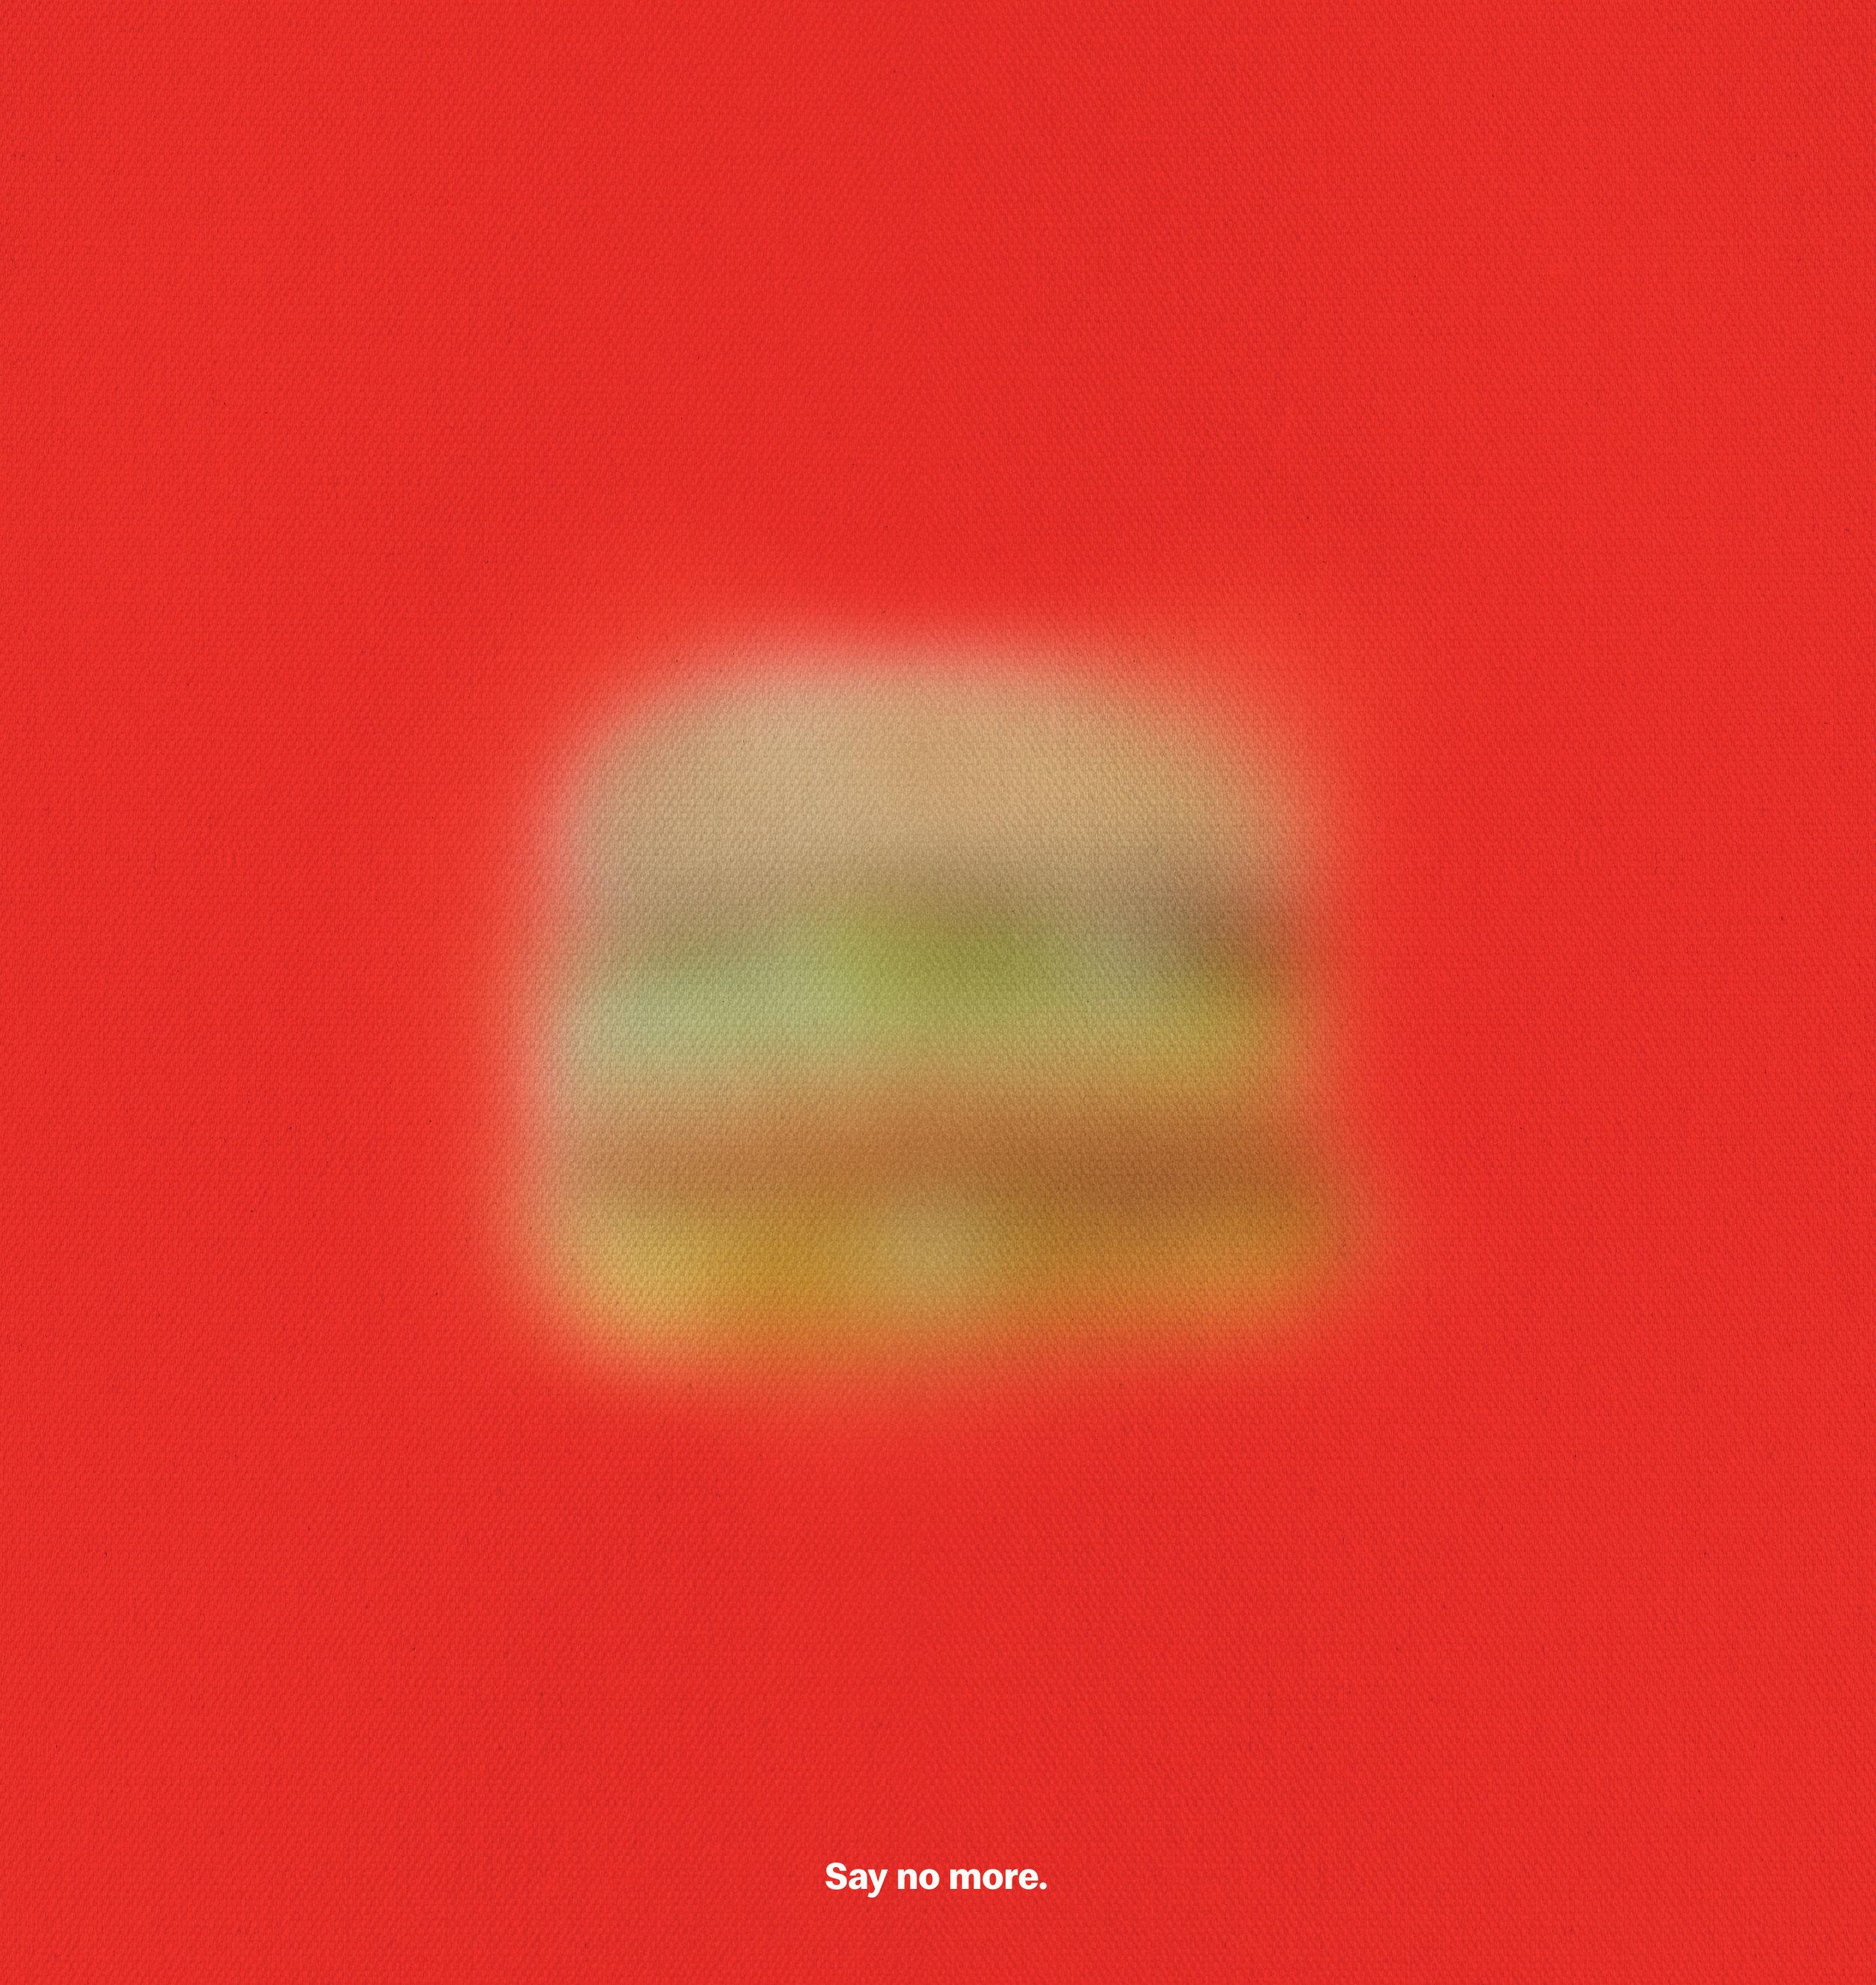 Blurred Icons - Say No More-BigMac Print.jpg